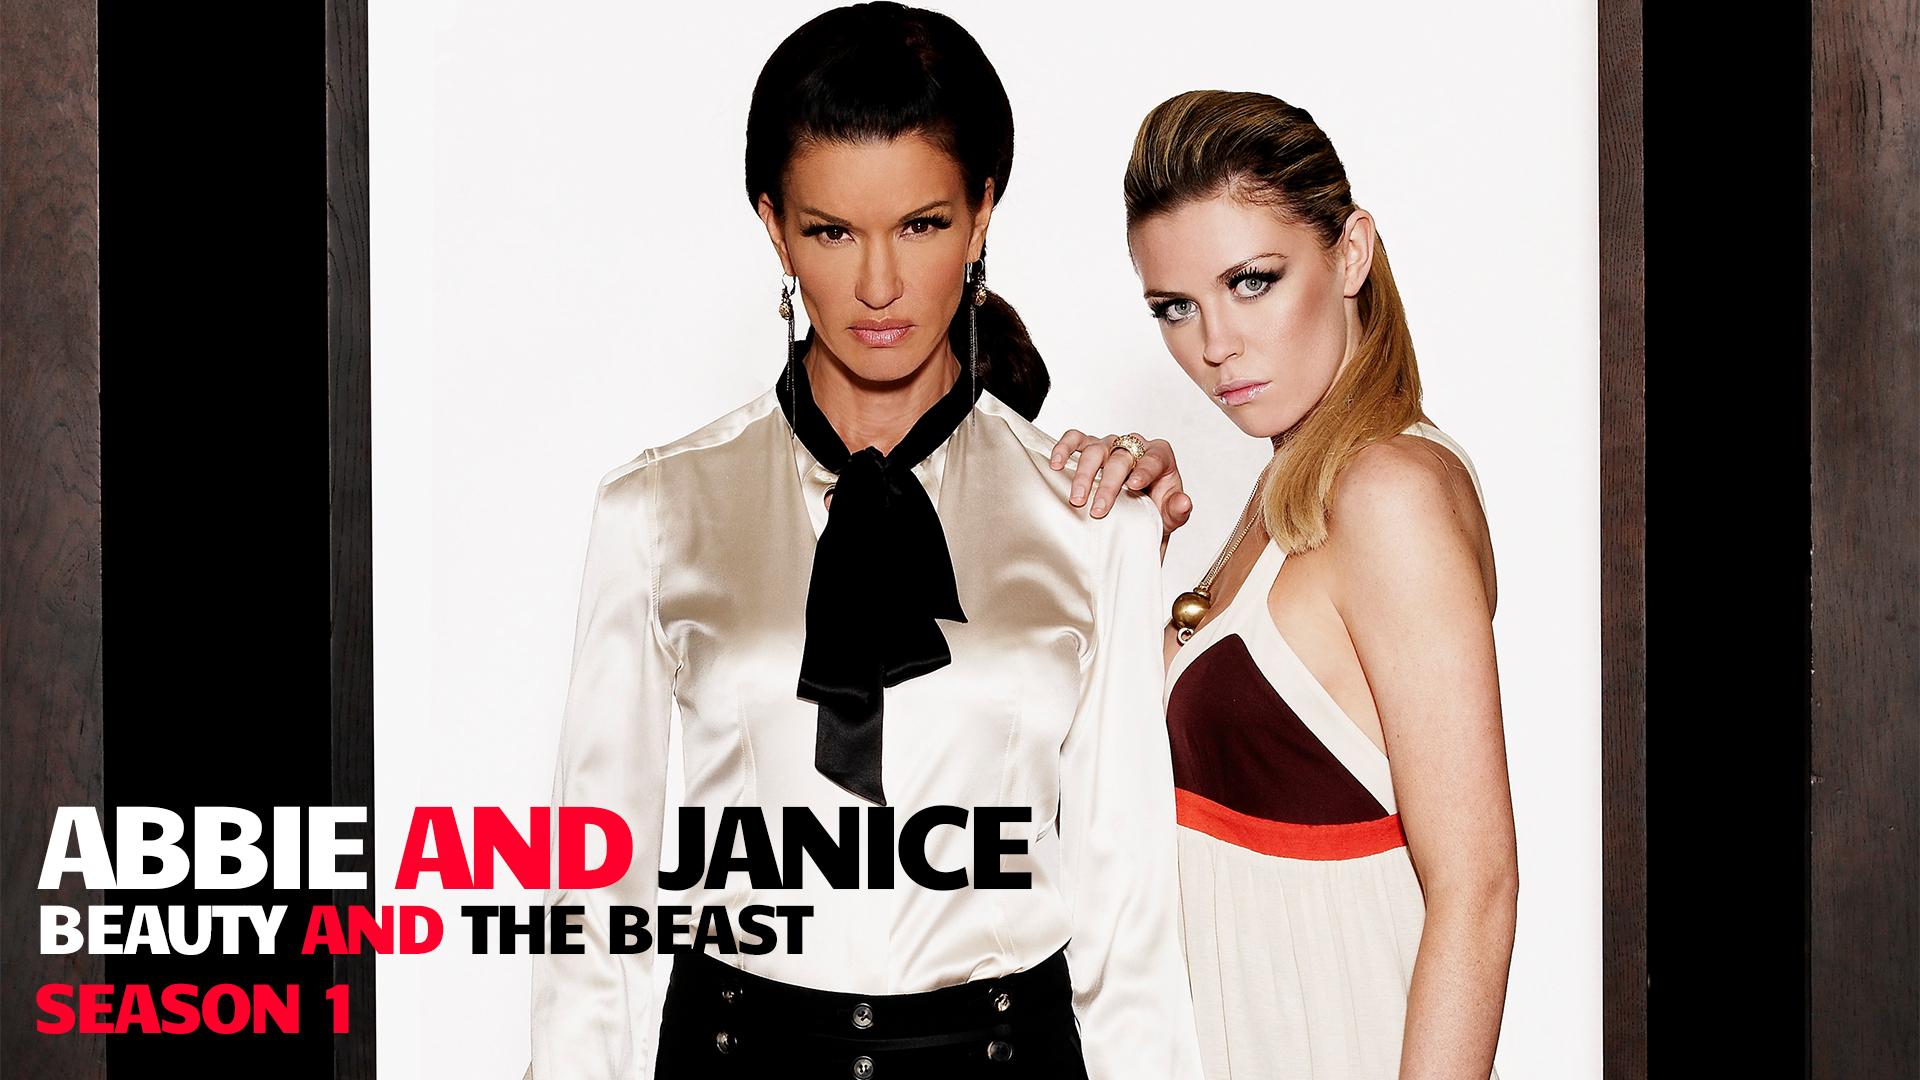 Abbey & Janice: Beauty and the Beast